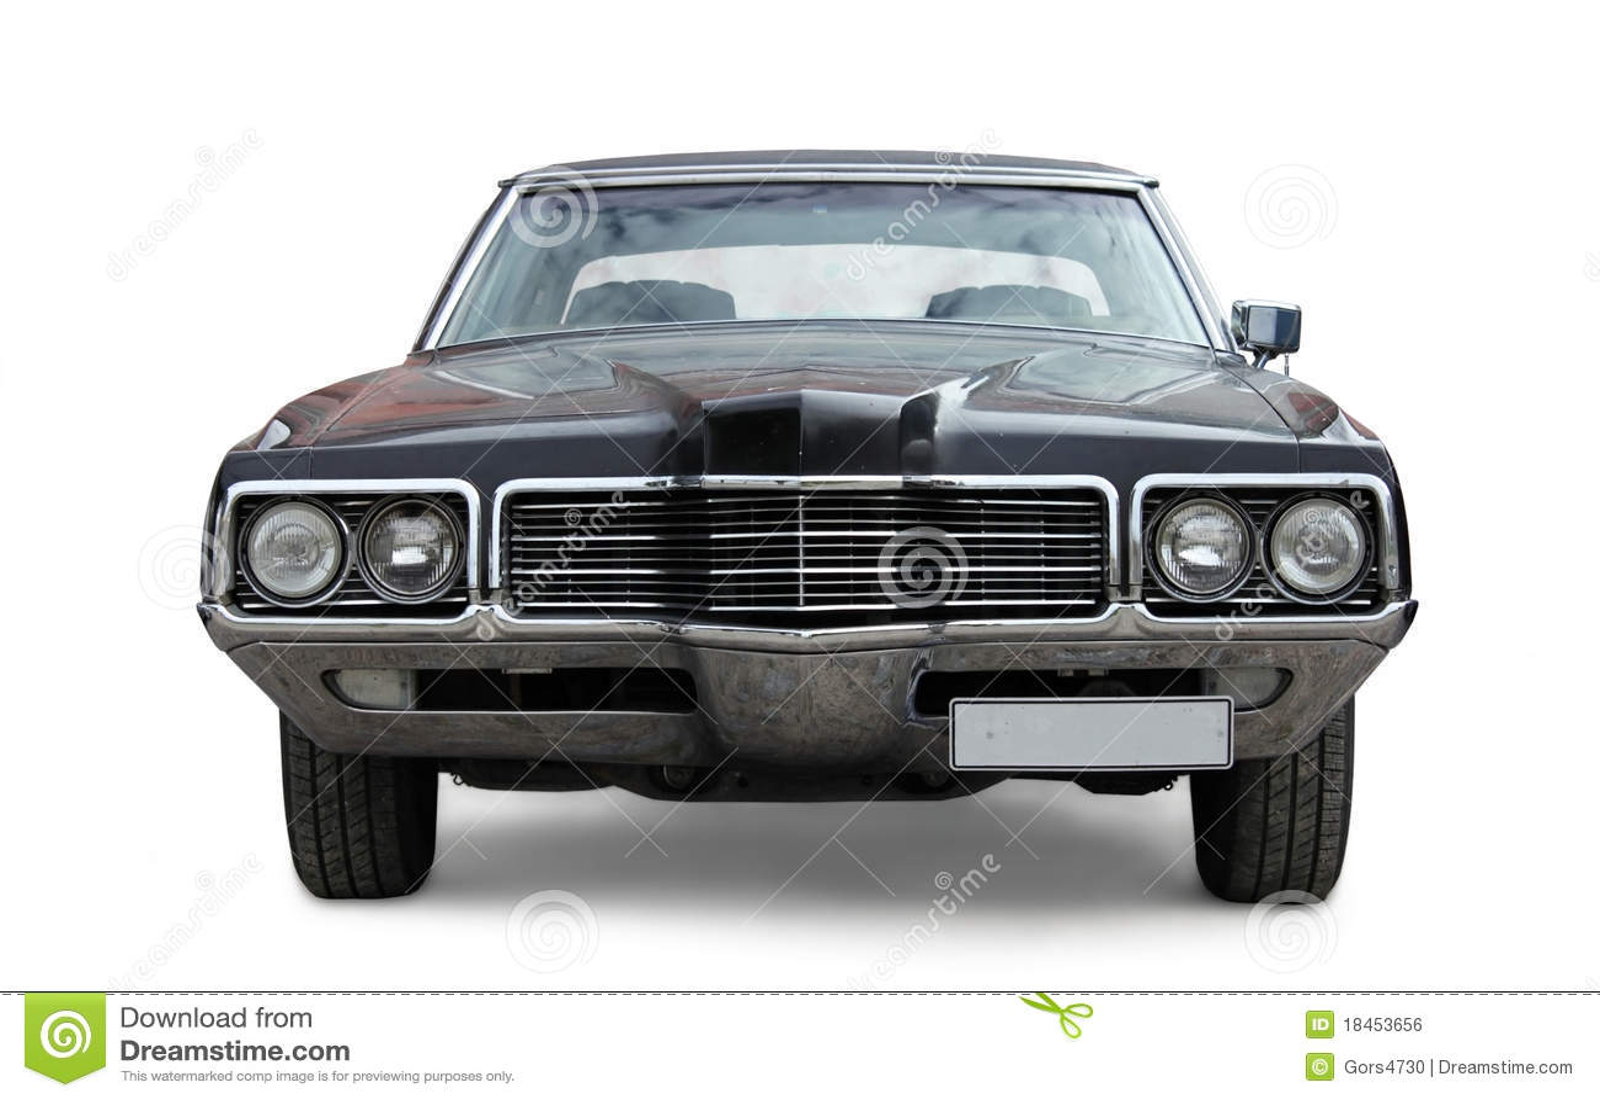 Gammal bil